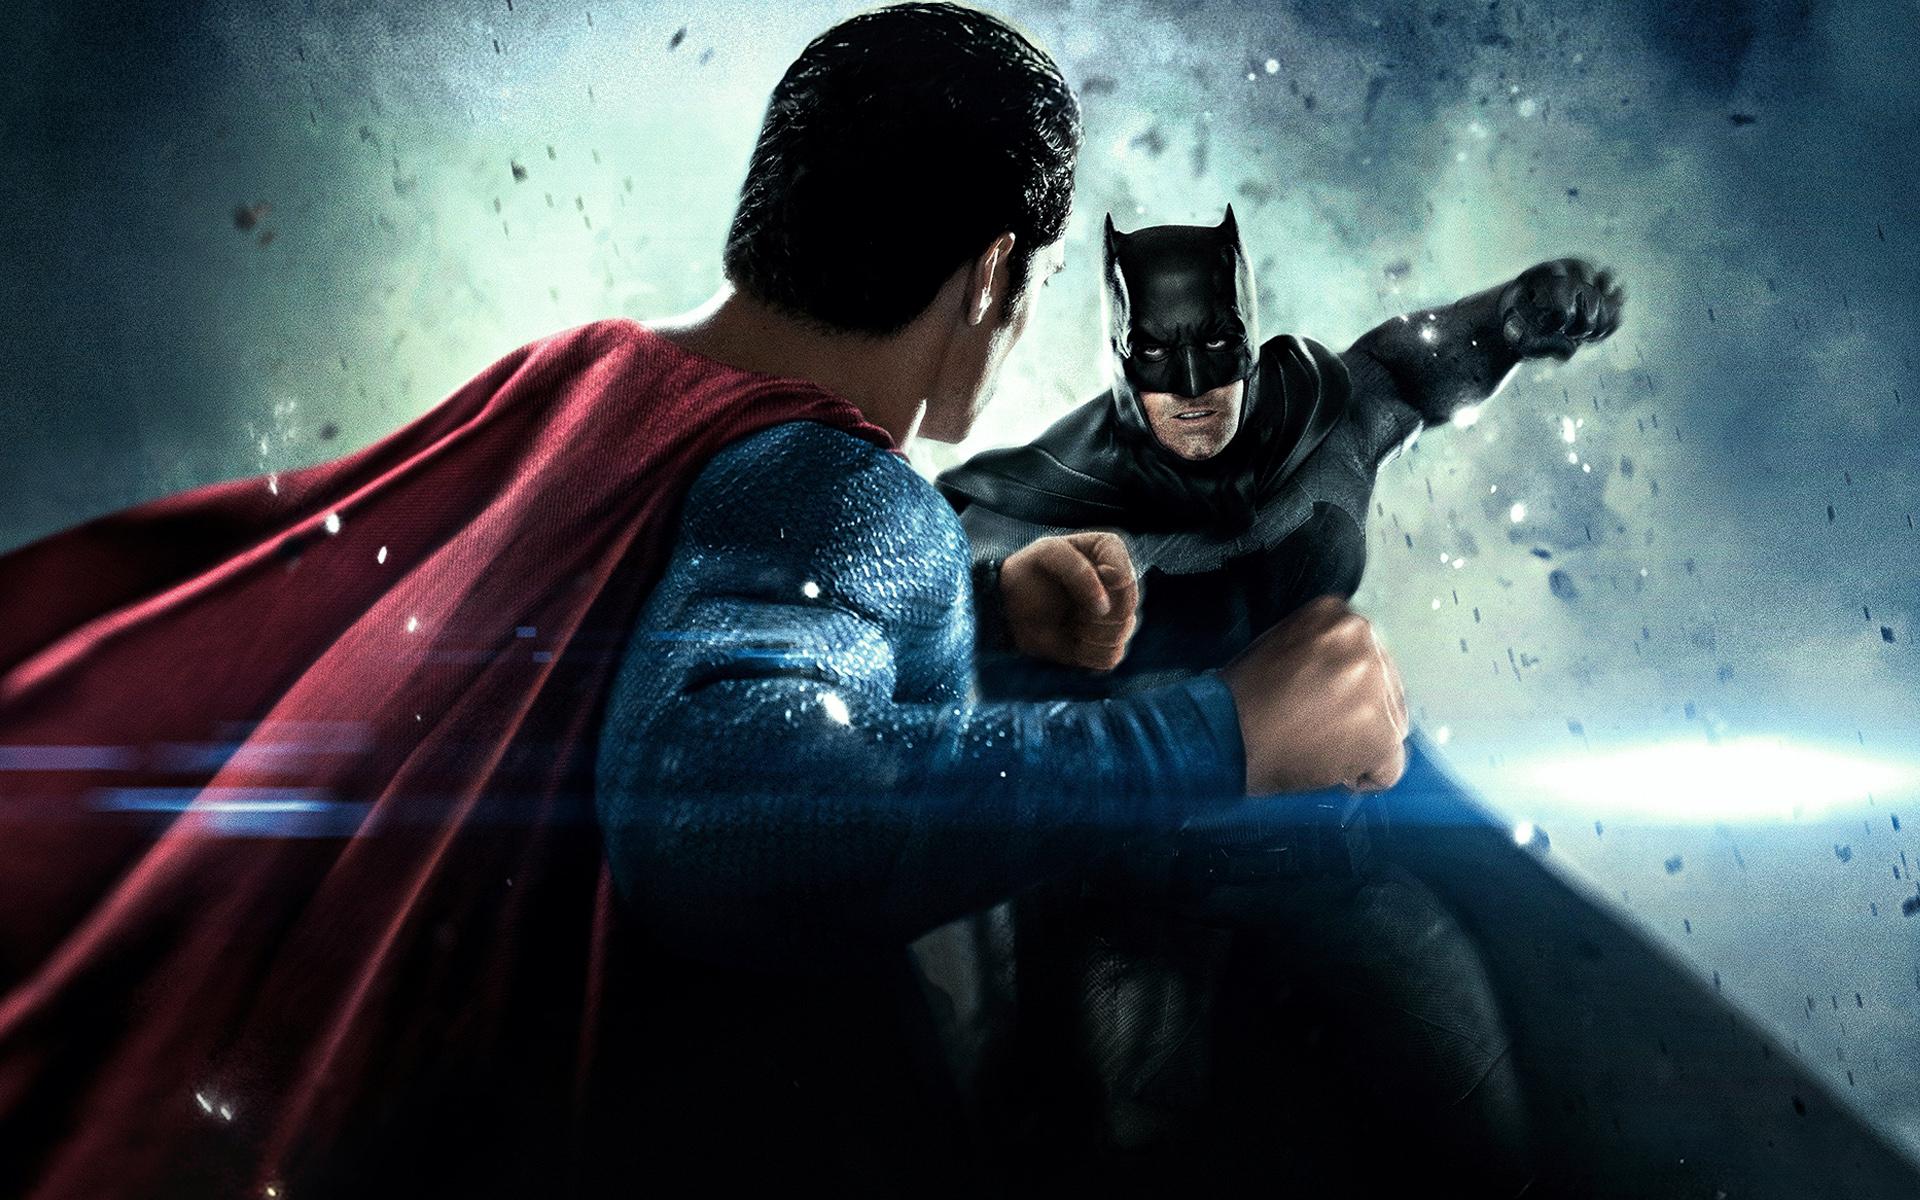 batman v superman: dawn of justice hd wallpapers free download 1920x1200